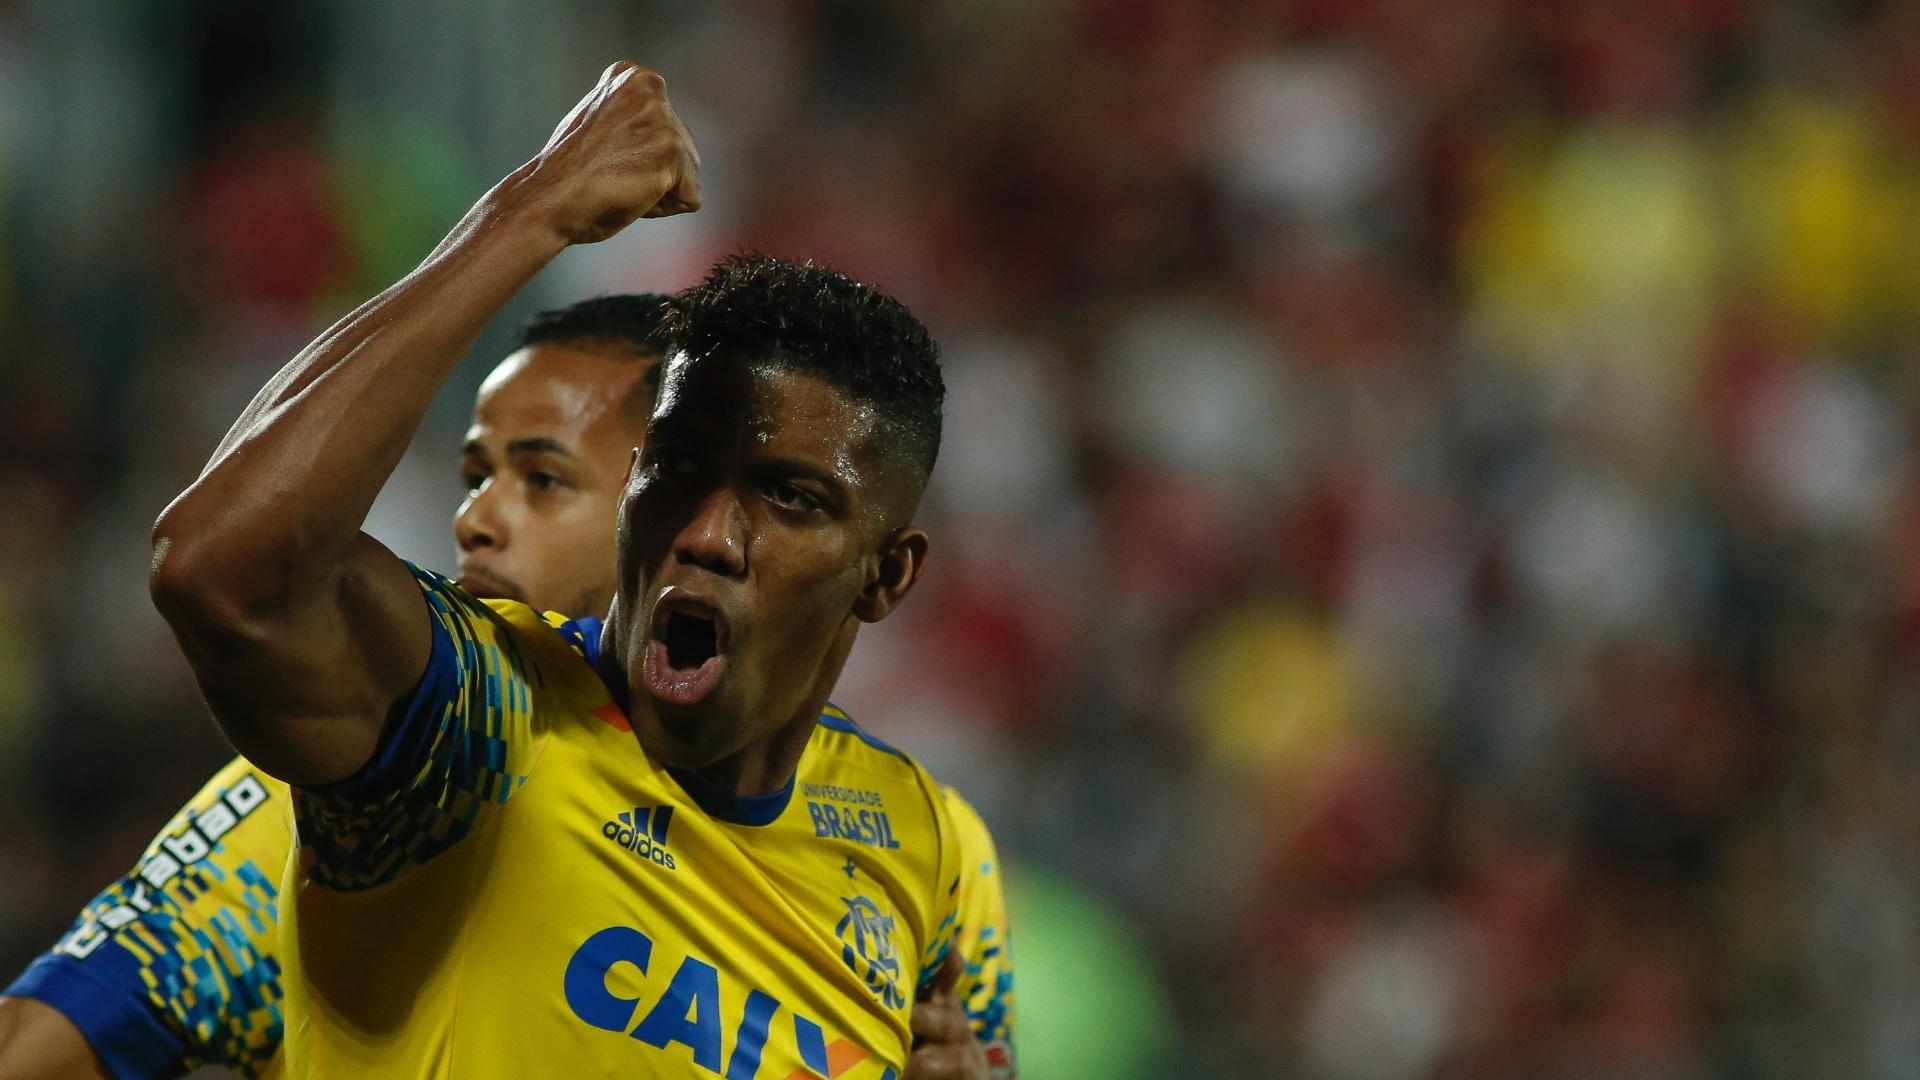 Berrío comemora gol marcado pelo Flamengo contra o Coritiba pelo Campeonato Brasileiro